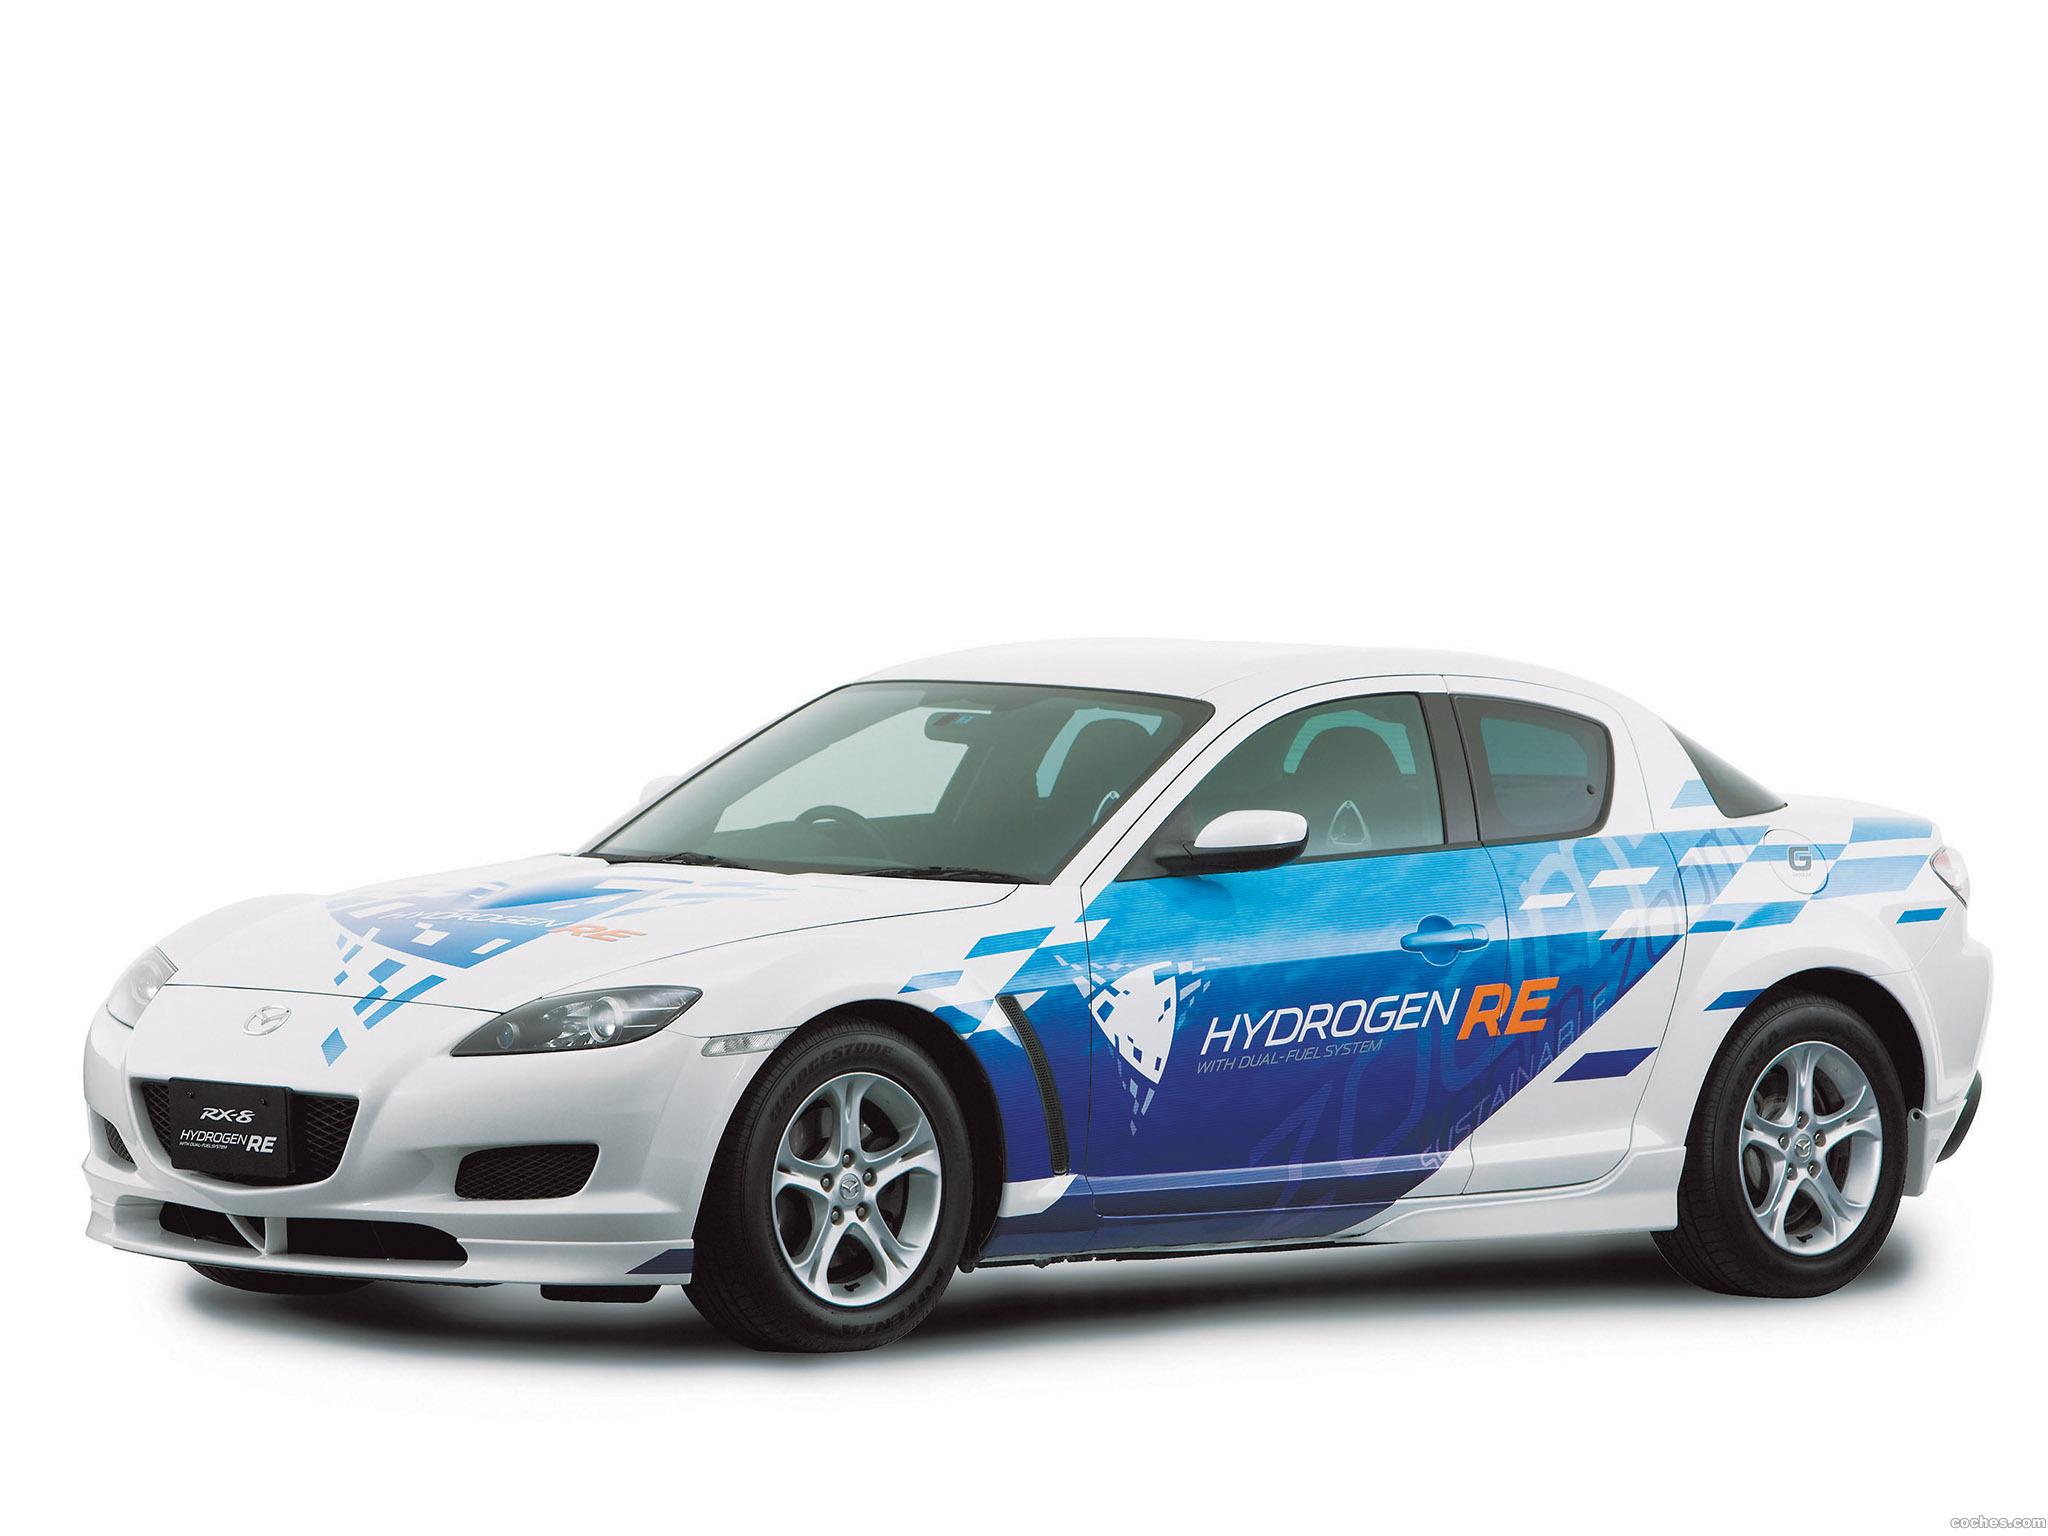 Foto 14 de Mazda RX-8 Hydrogen Re Dual Fuel System 2009